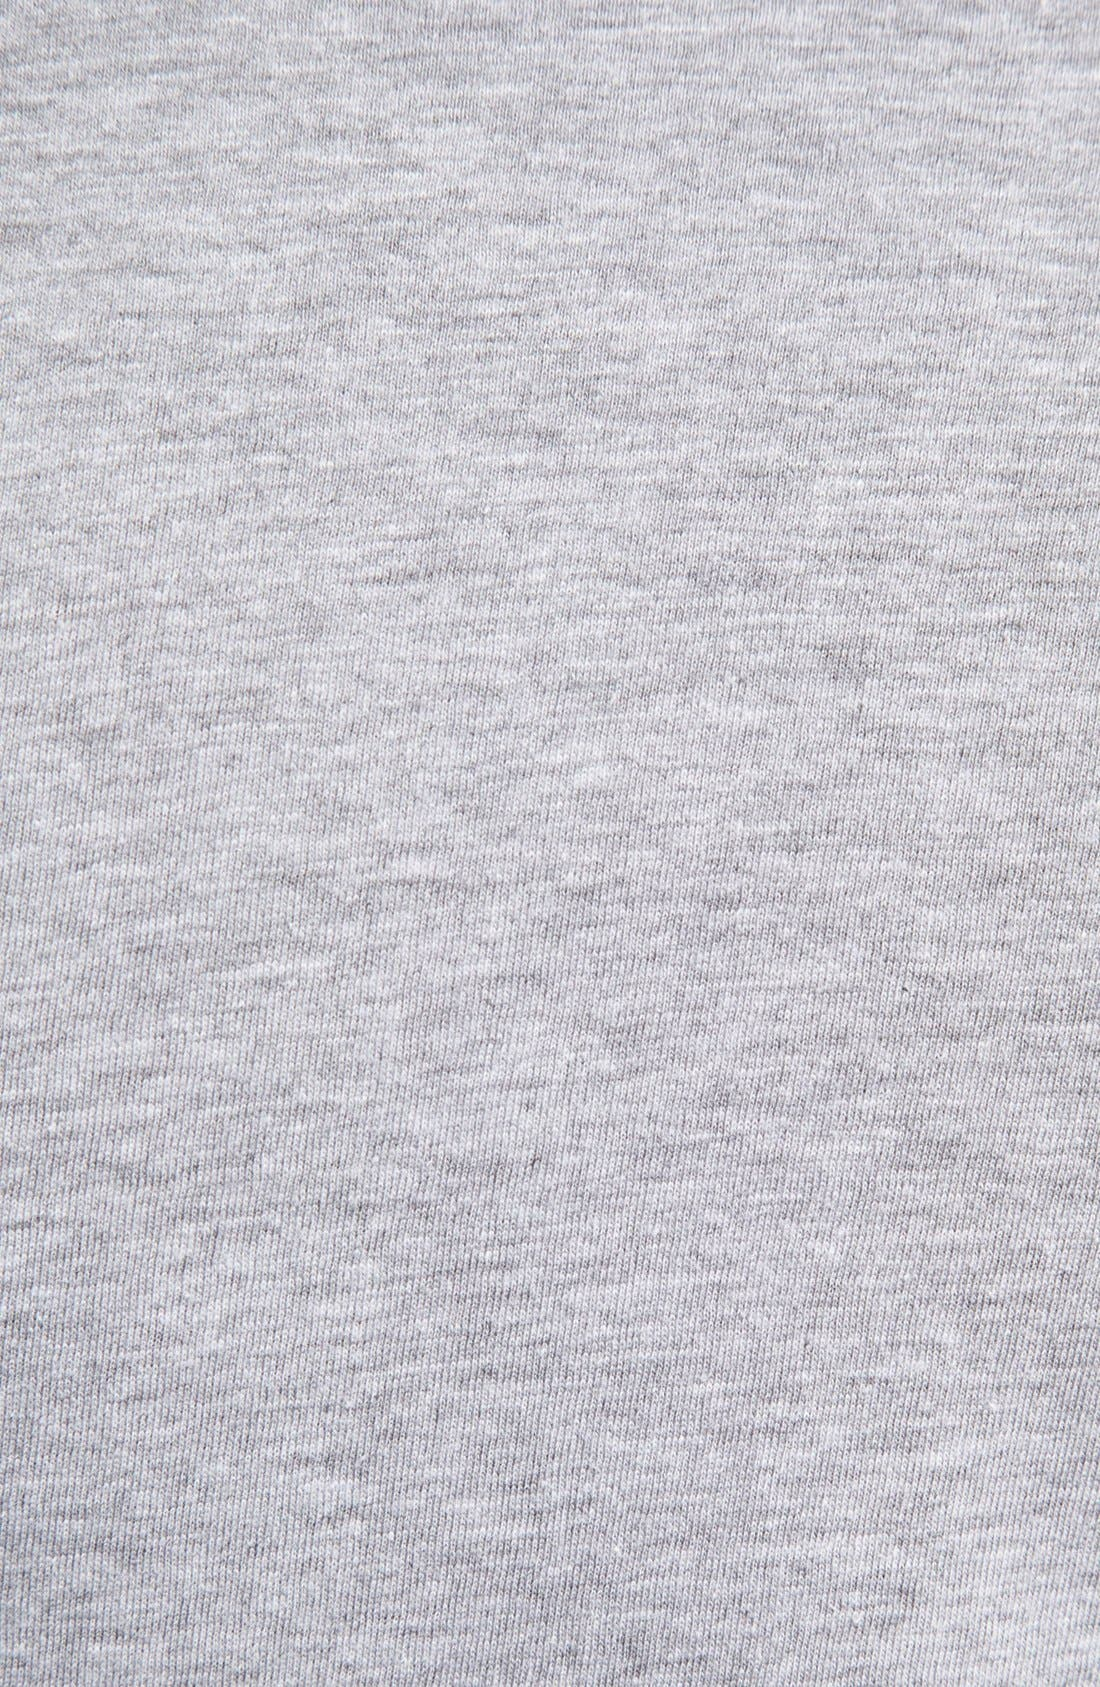 Alternate Image 3  - ELEVENPARIS 'El Bandito' V-Neck T-Shirt